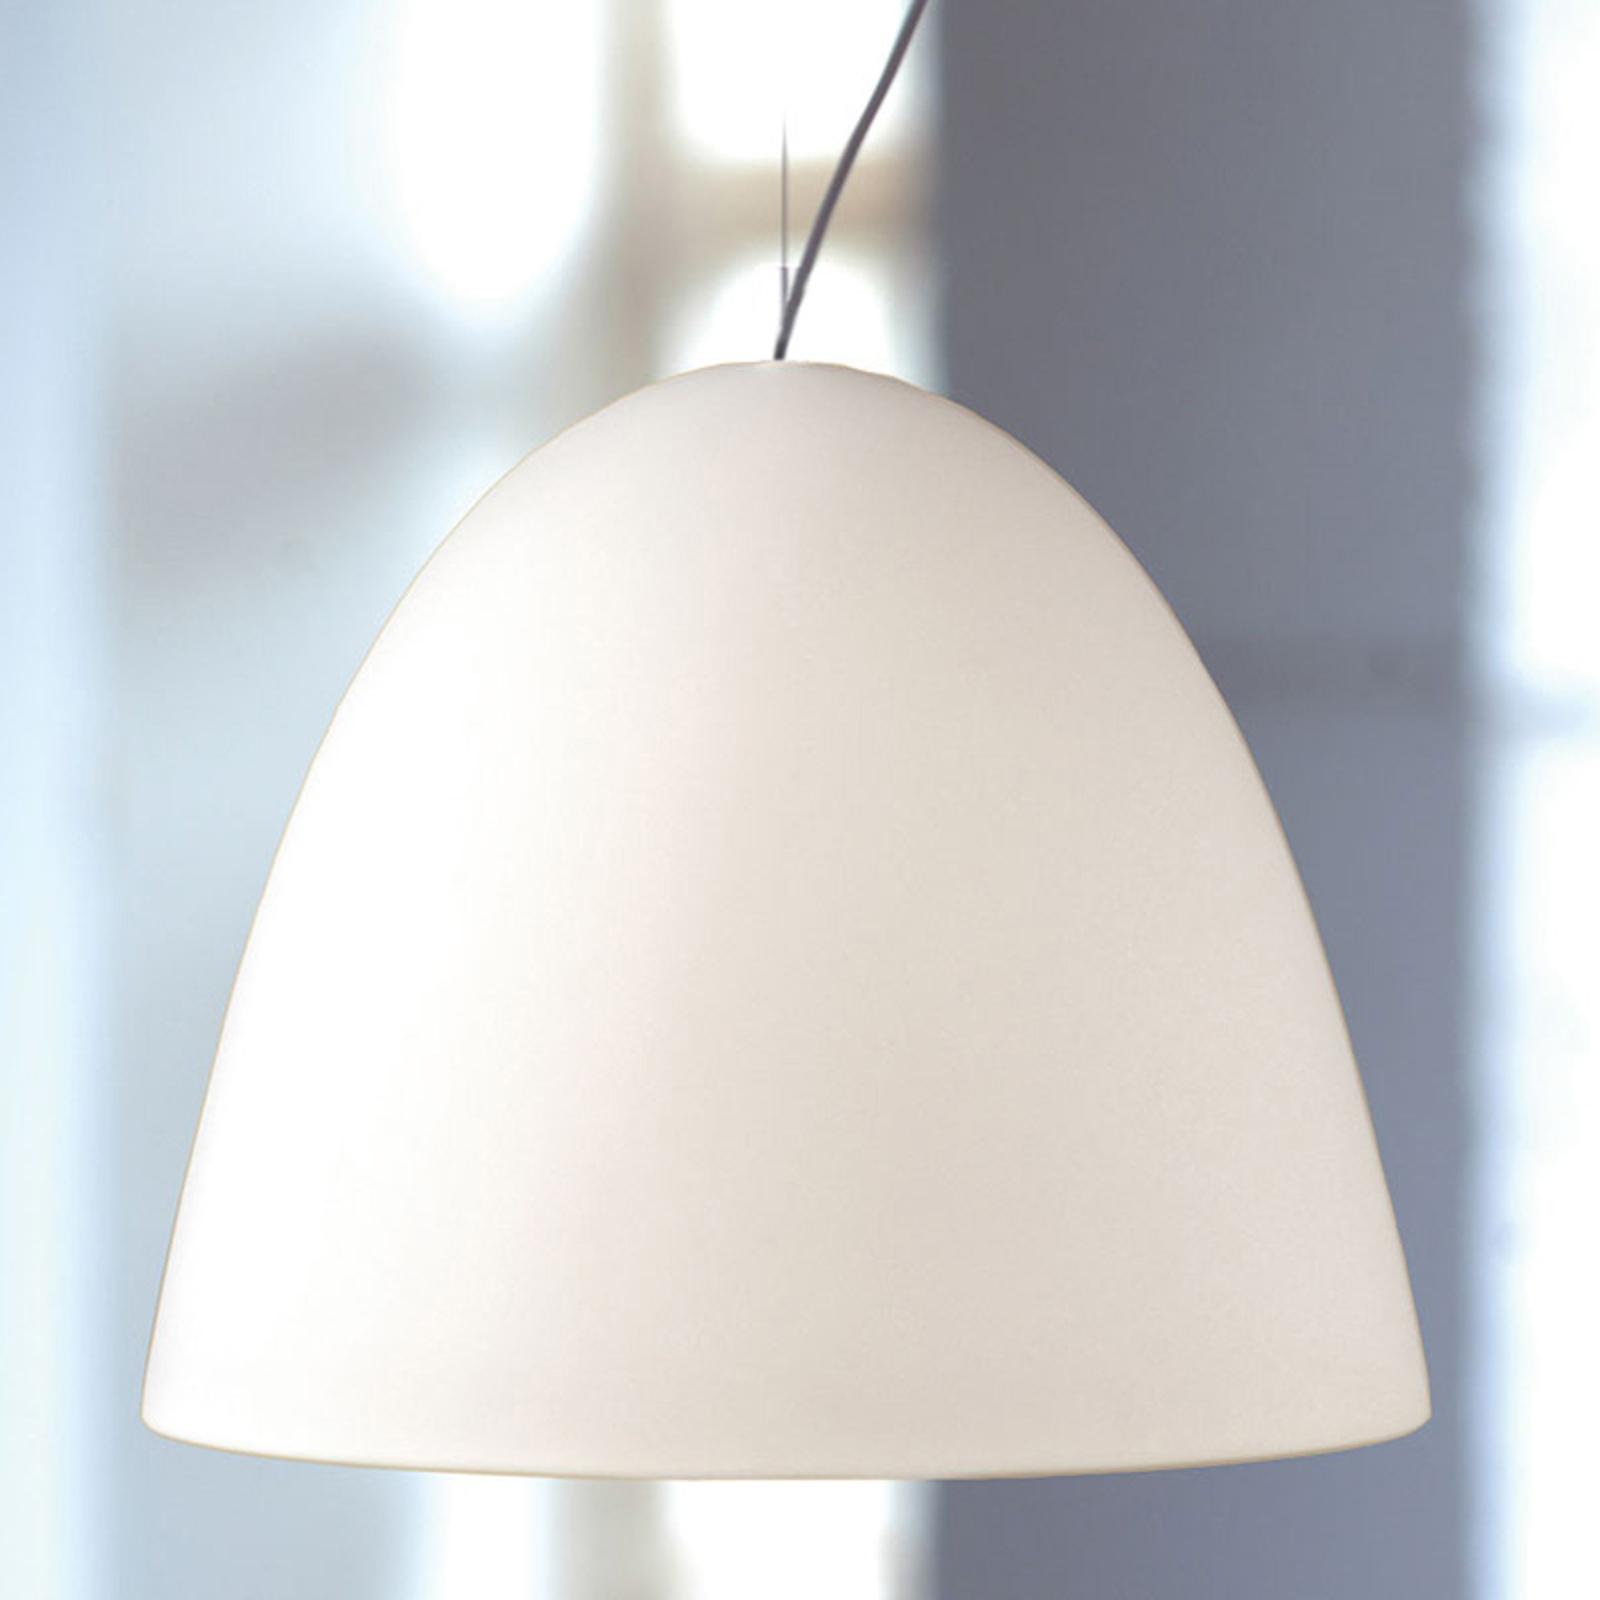 Lampada a sospensione BELL 30 cm 1 lampadina